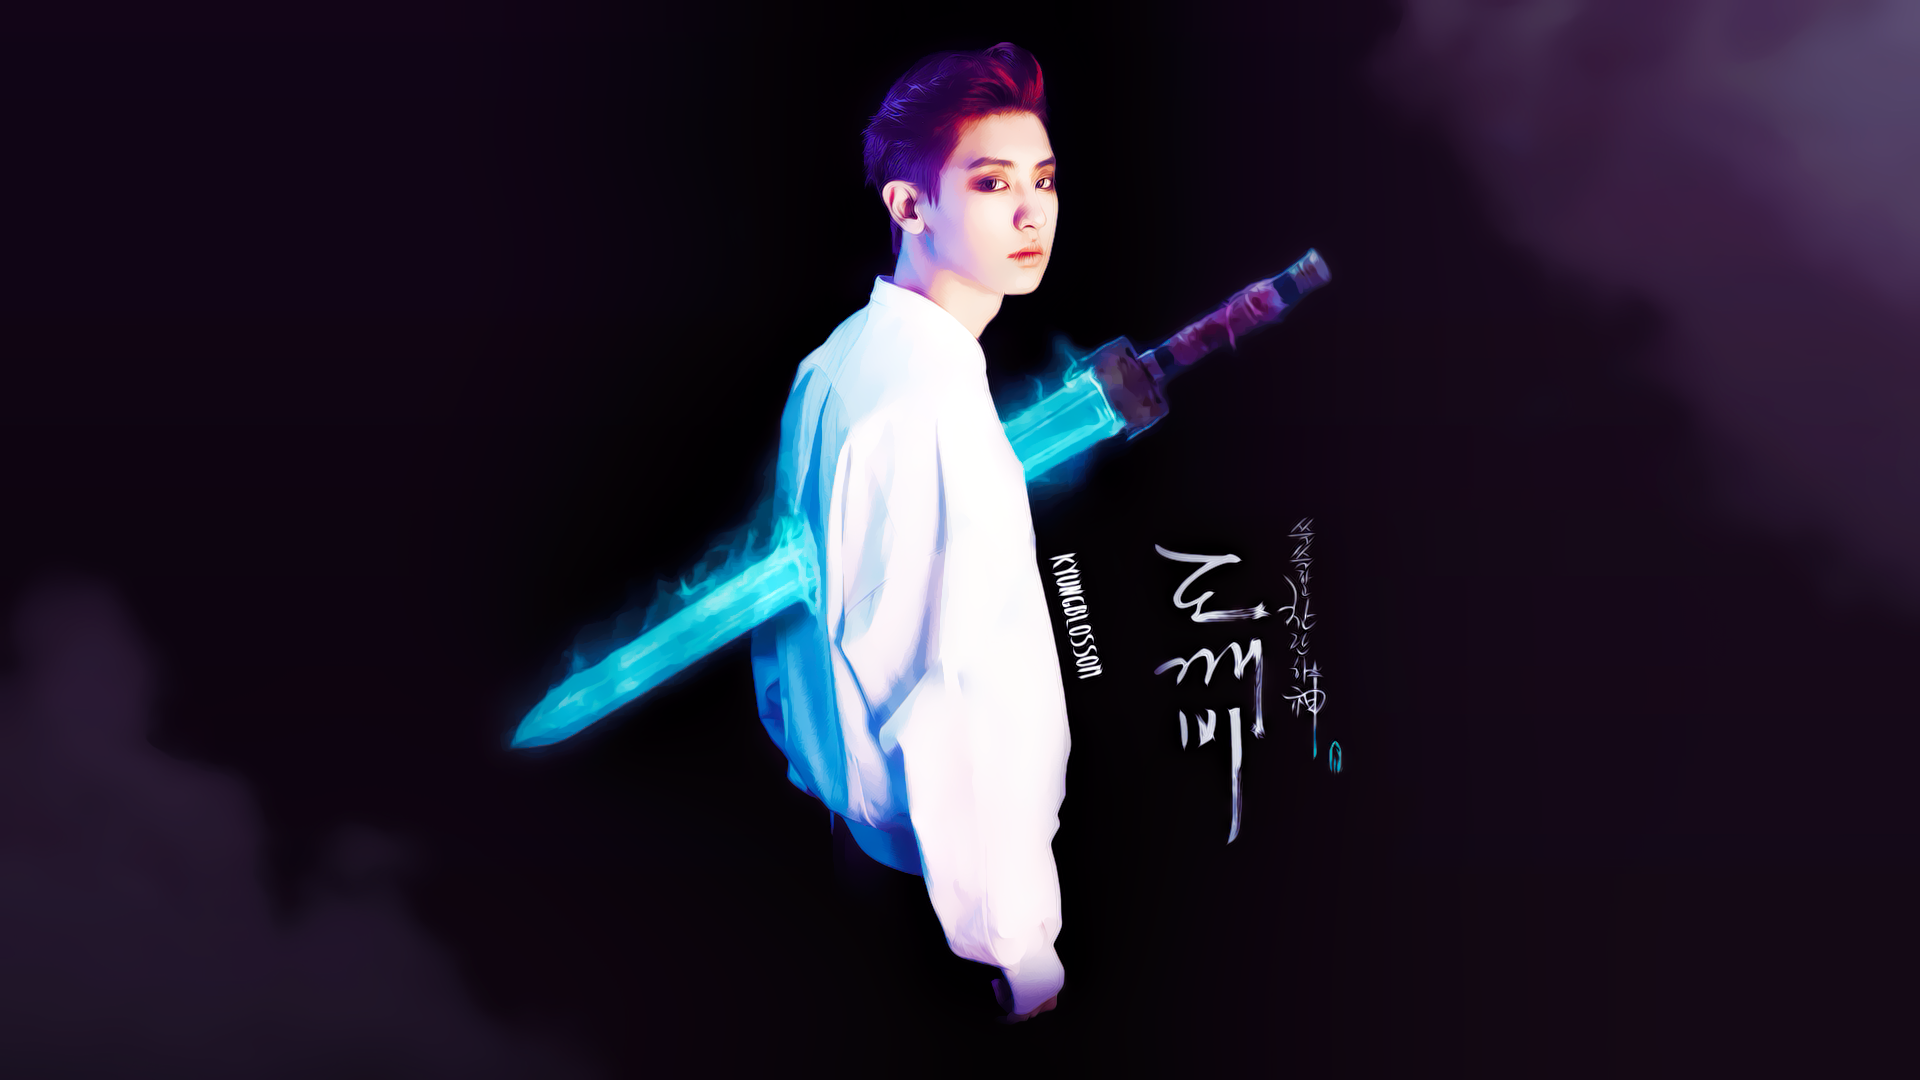 Chanyeol Goblin Sword Wallpaper KyungBlossom